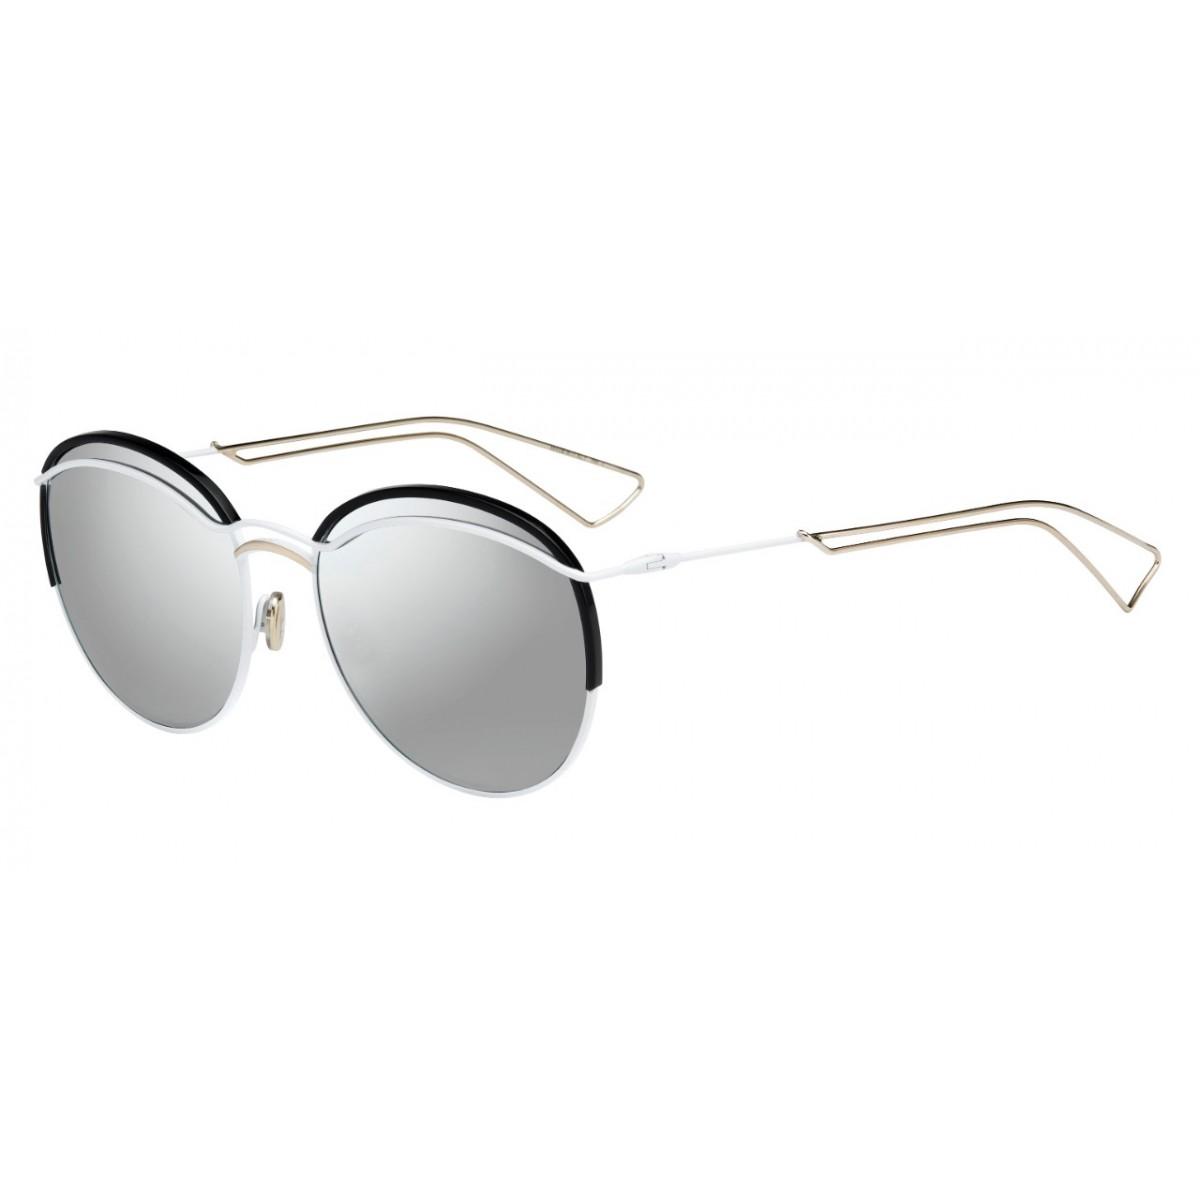 Dior Dioround   Occhiali da sole Unisex